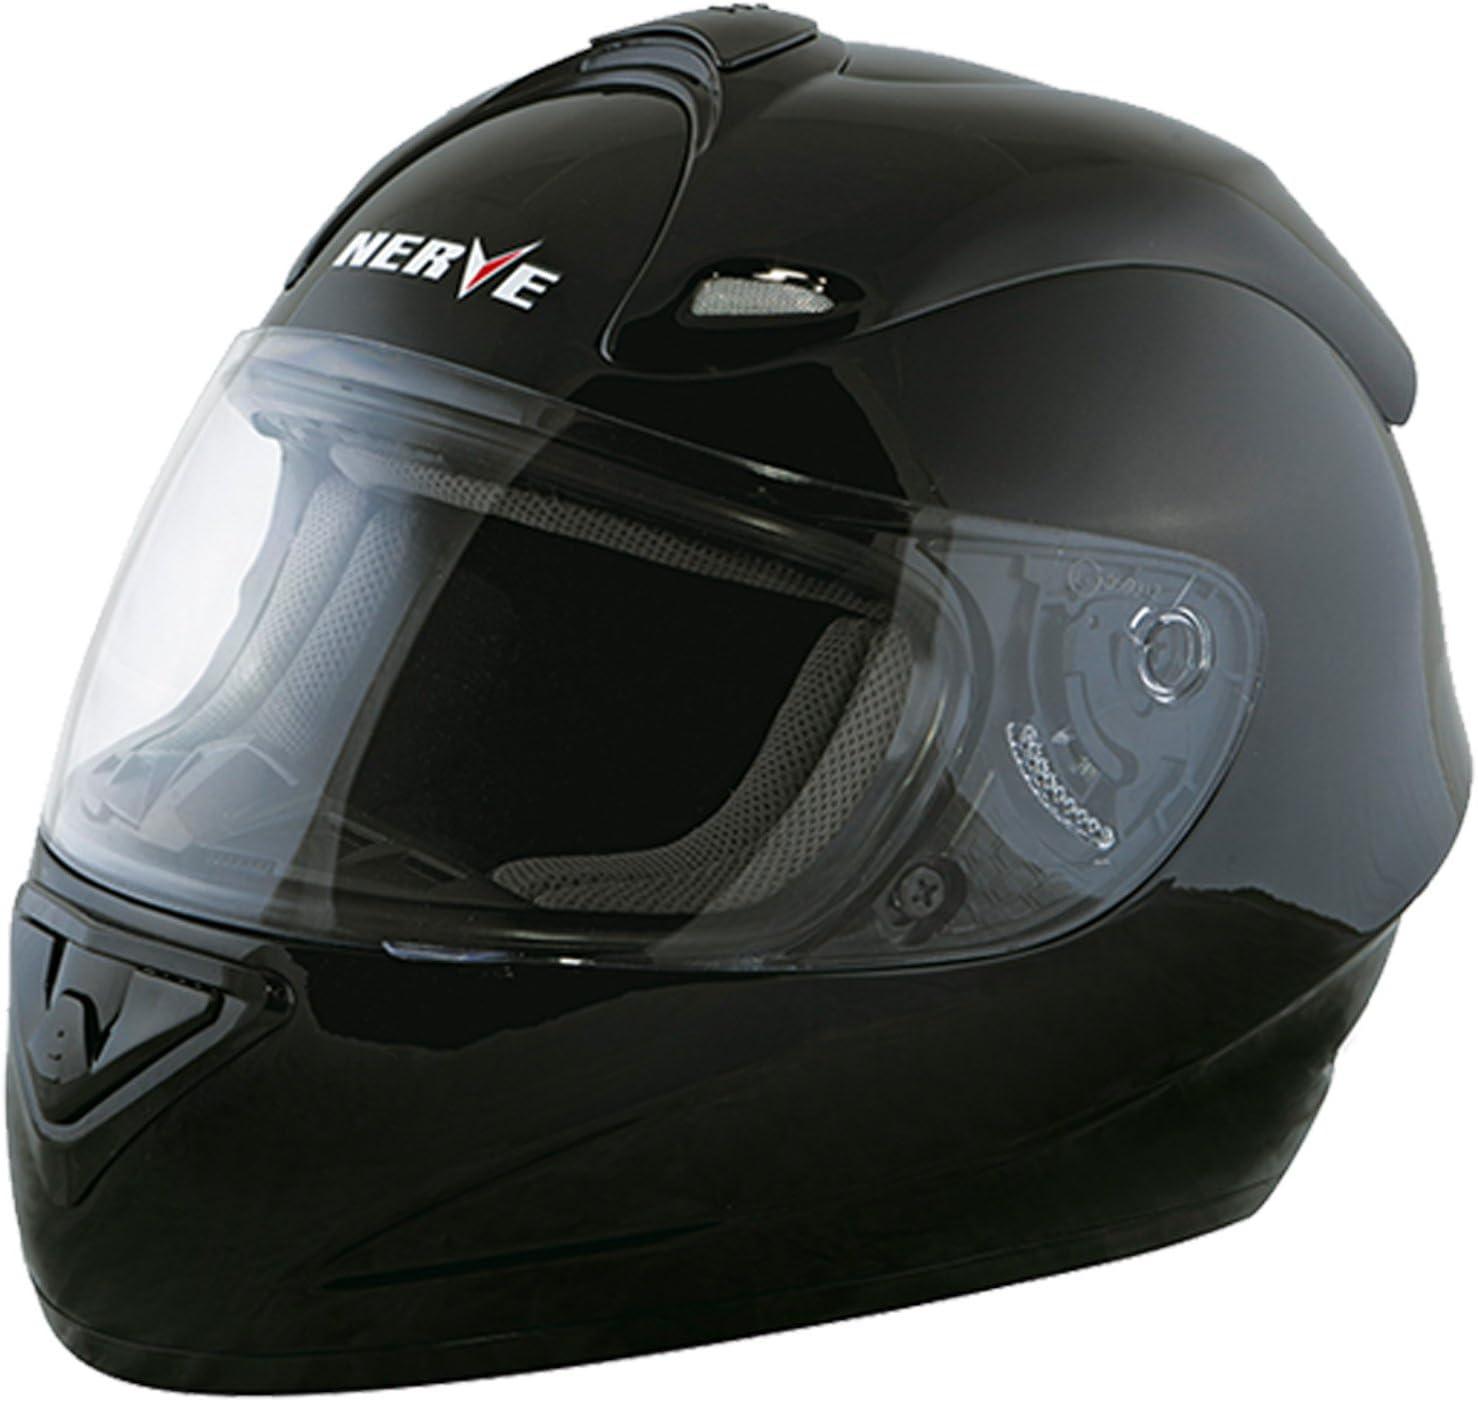 schwarz-blau Nerve Shop Motorradhelm Integralhelm NS2013 Vollvisierhelm Fullface Motorrad Helm Mofa Motorroller Damen Herren Erwachsene XL